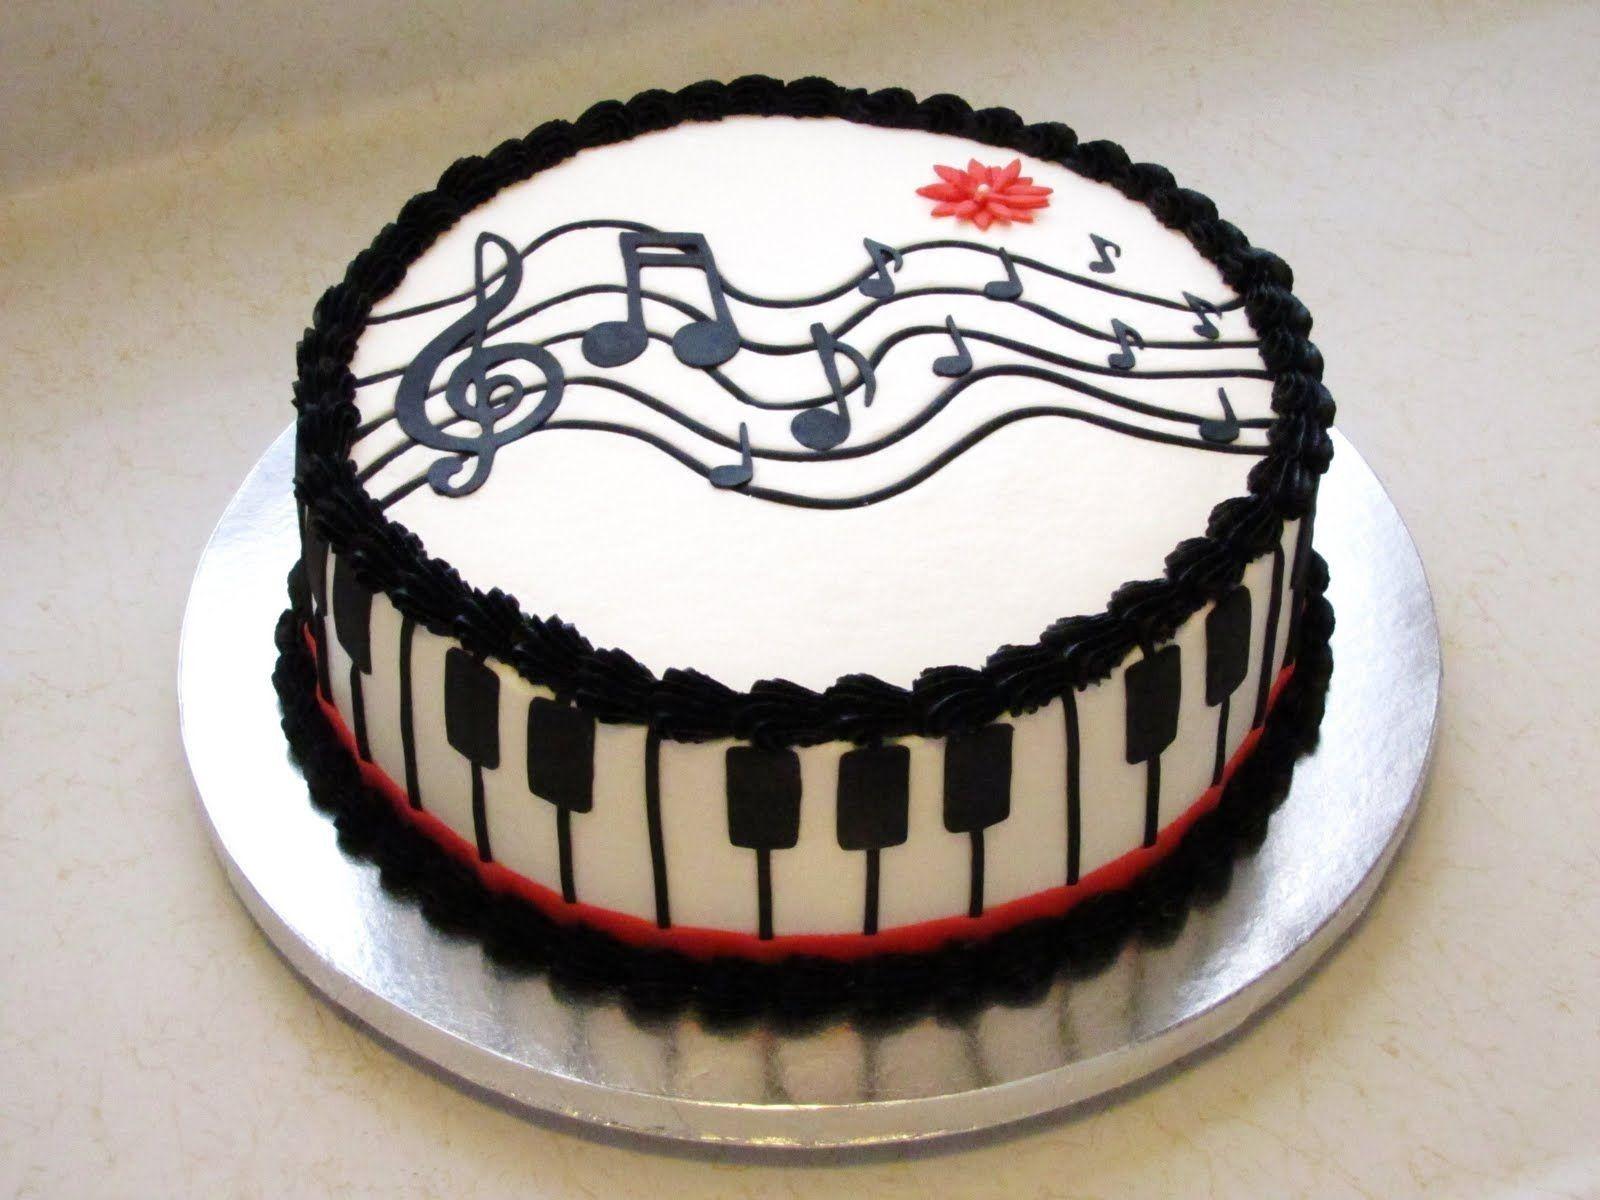 Wondrous Pin On Birthday Cake Design Ideas Funny Birthday Cards Online Aeocydamsfinfo